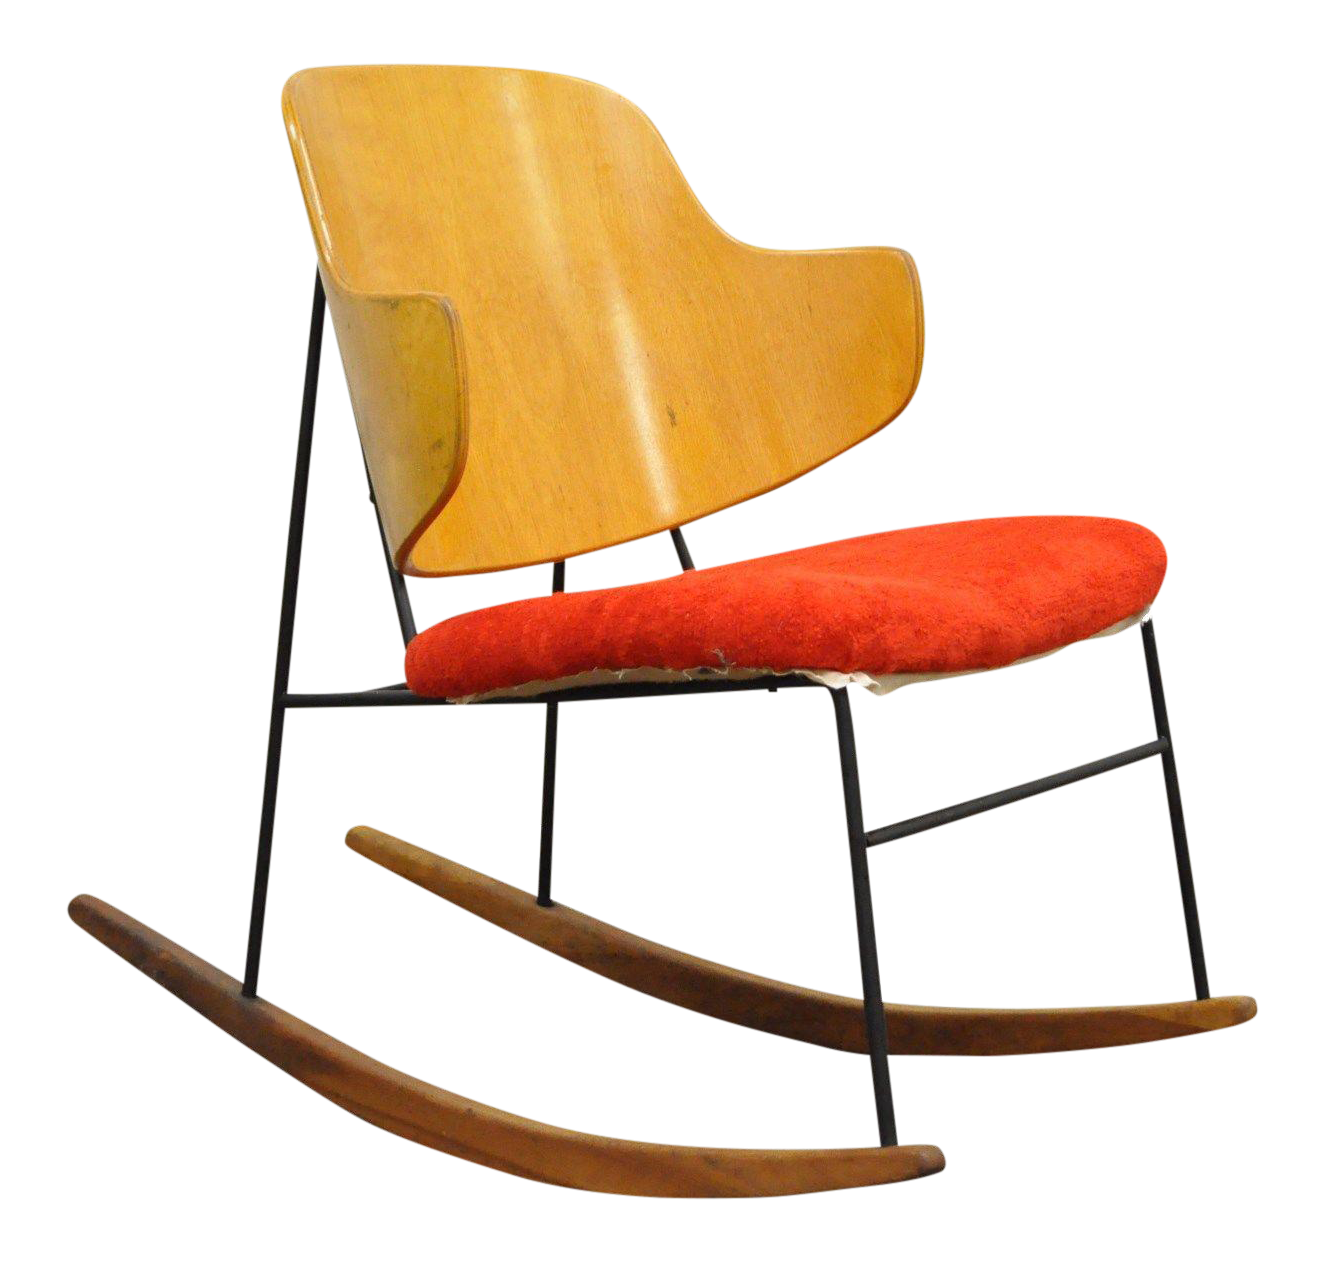 Vintage Mid Century Danish Modern Kofod Larsen Penguin Rocking Chair